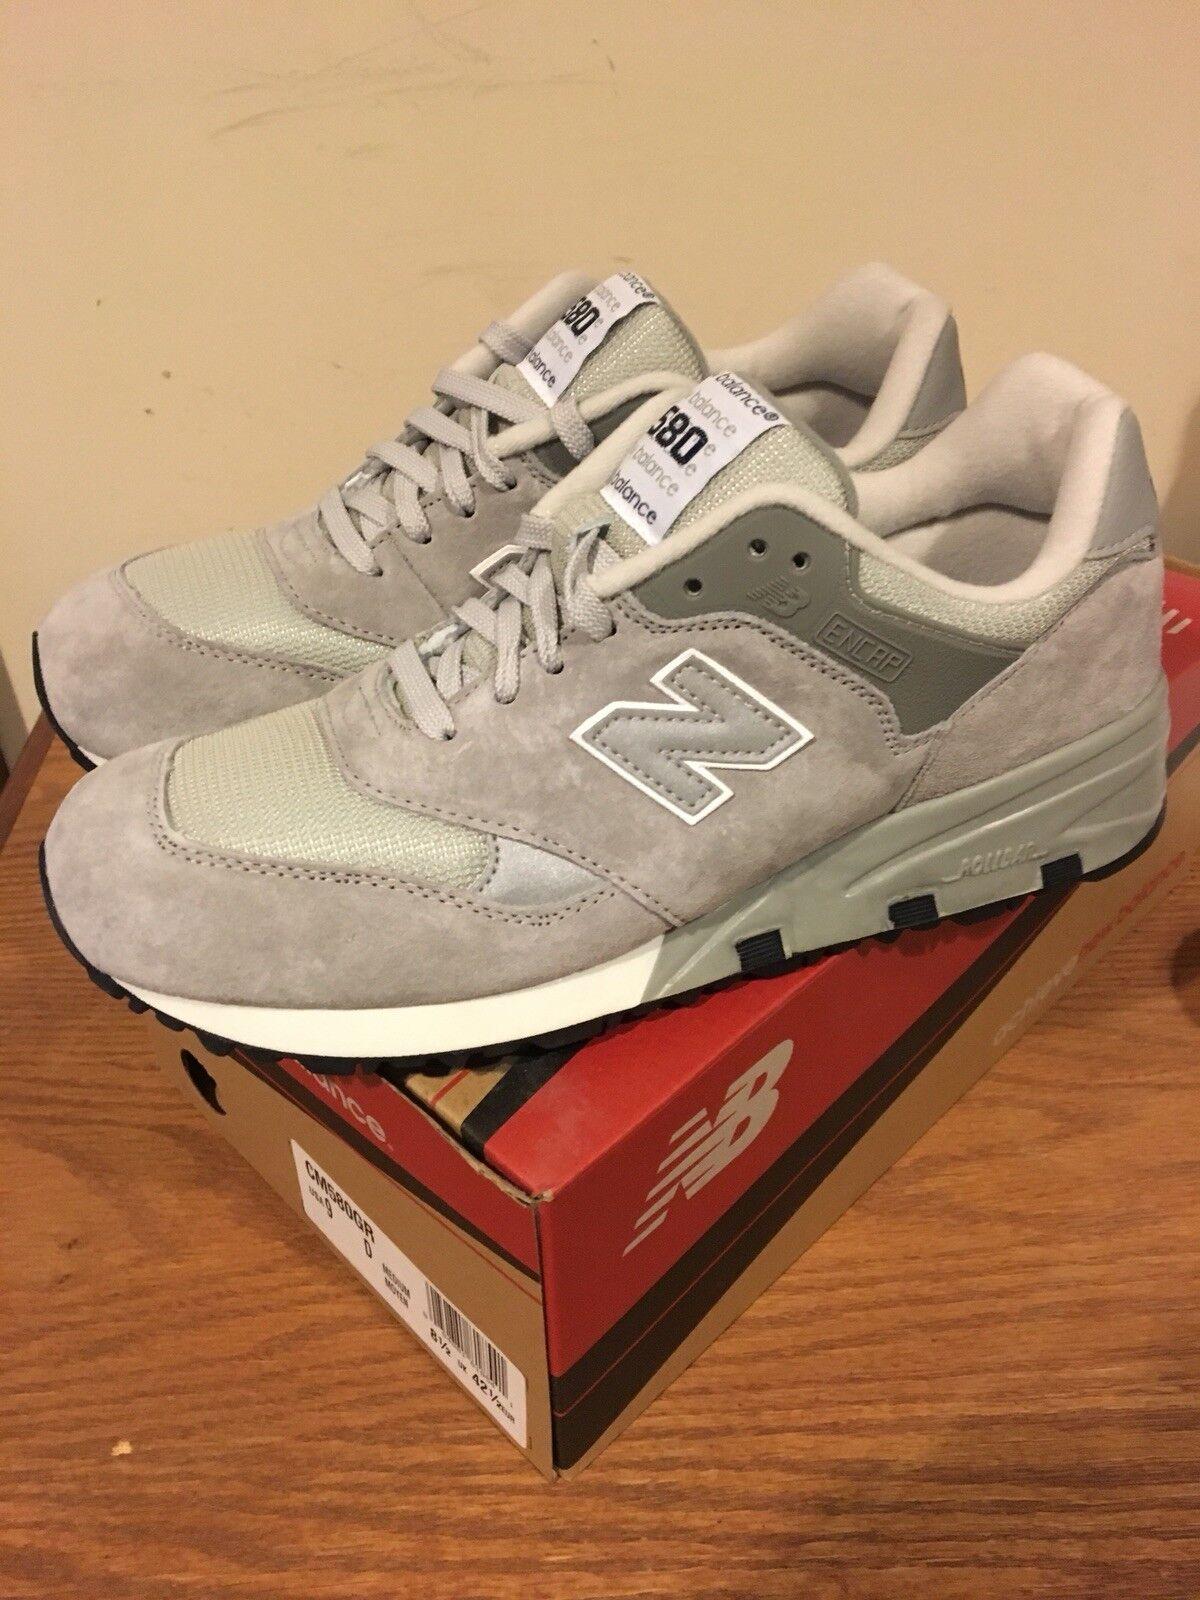 New Balance CM 580 GR Grey Size 9 New